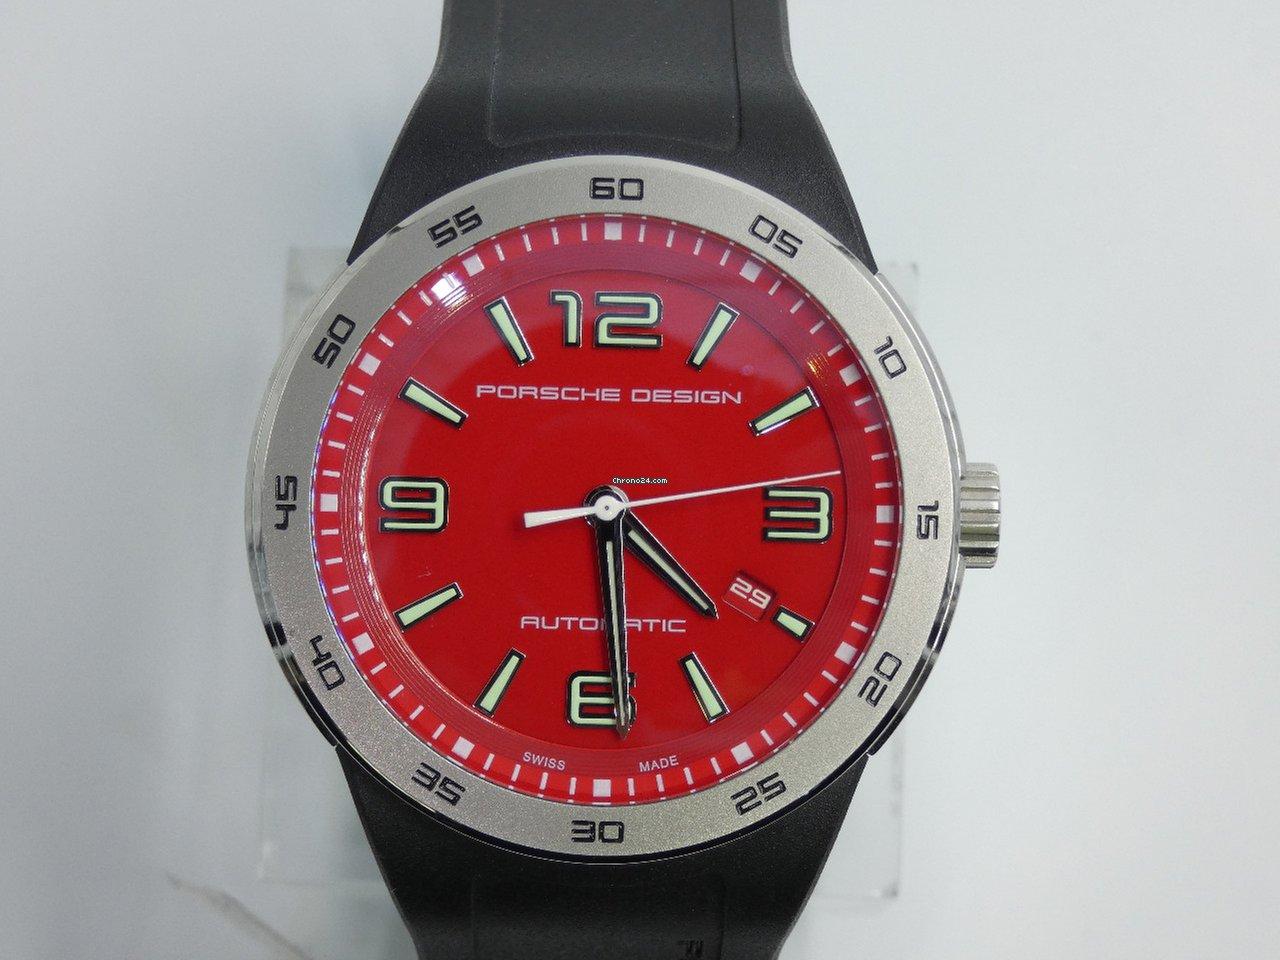 a80fa508b821 Relojes Porsche Design - Precios de todos los relojes Porsche Design en  Chrono24